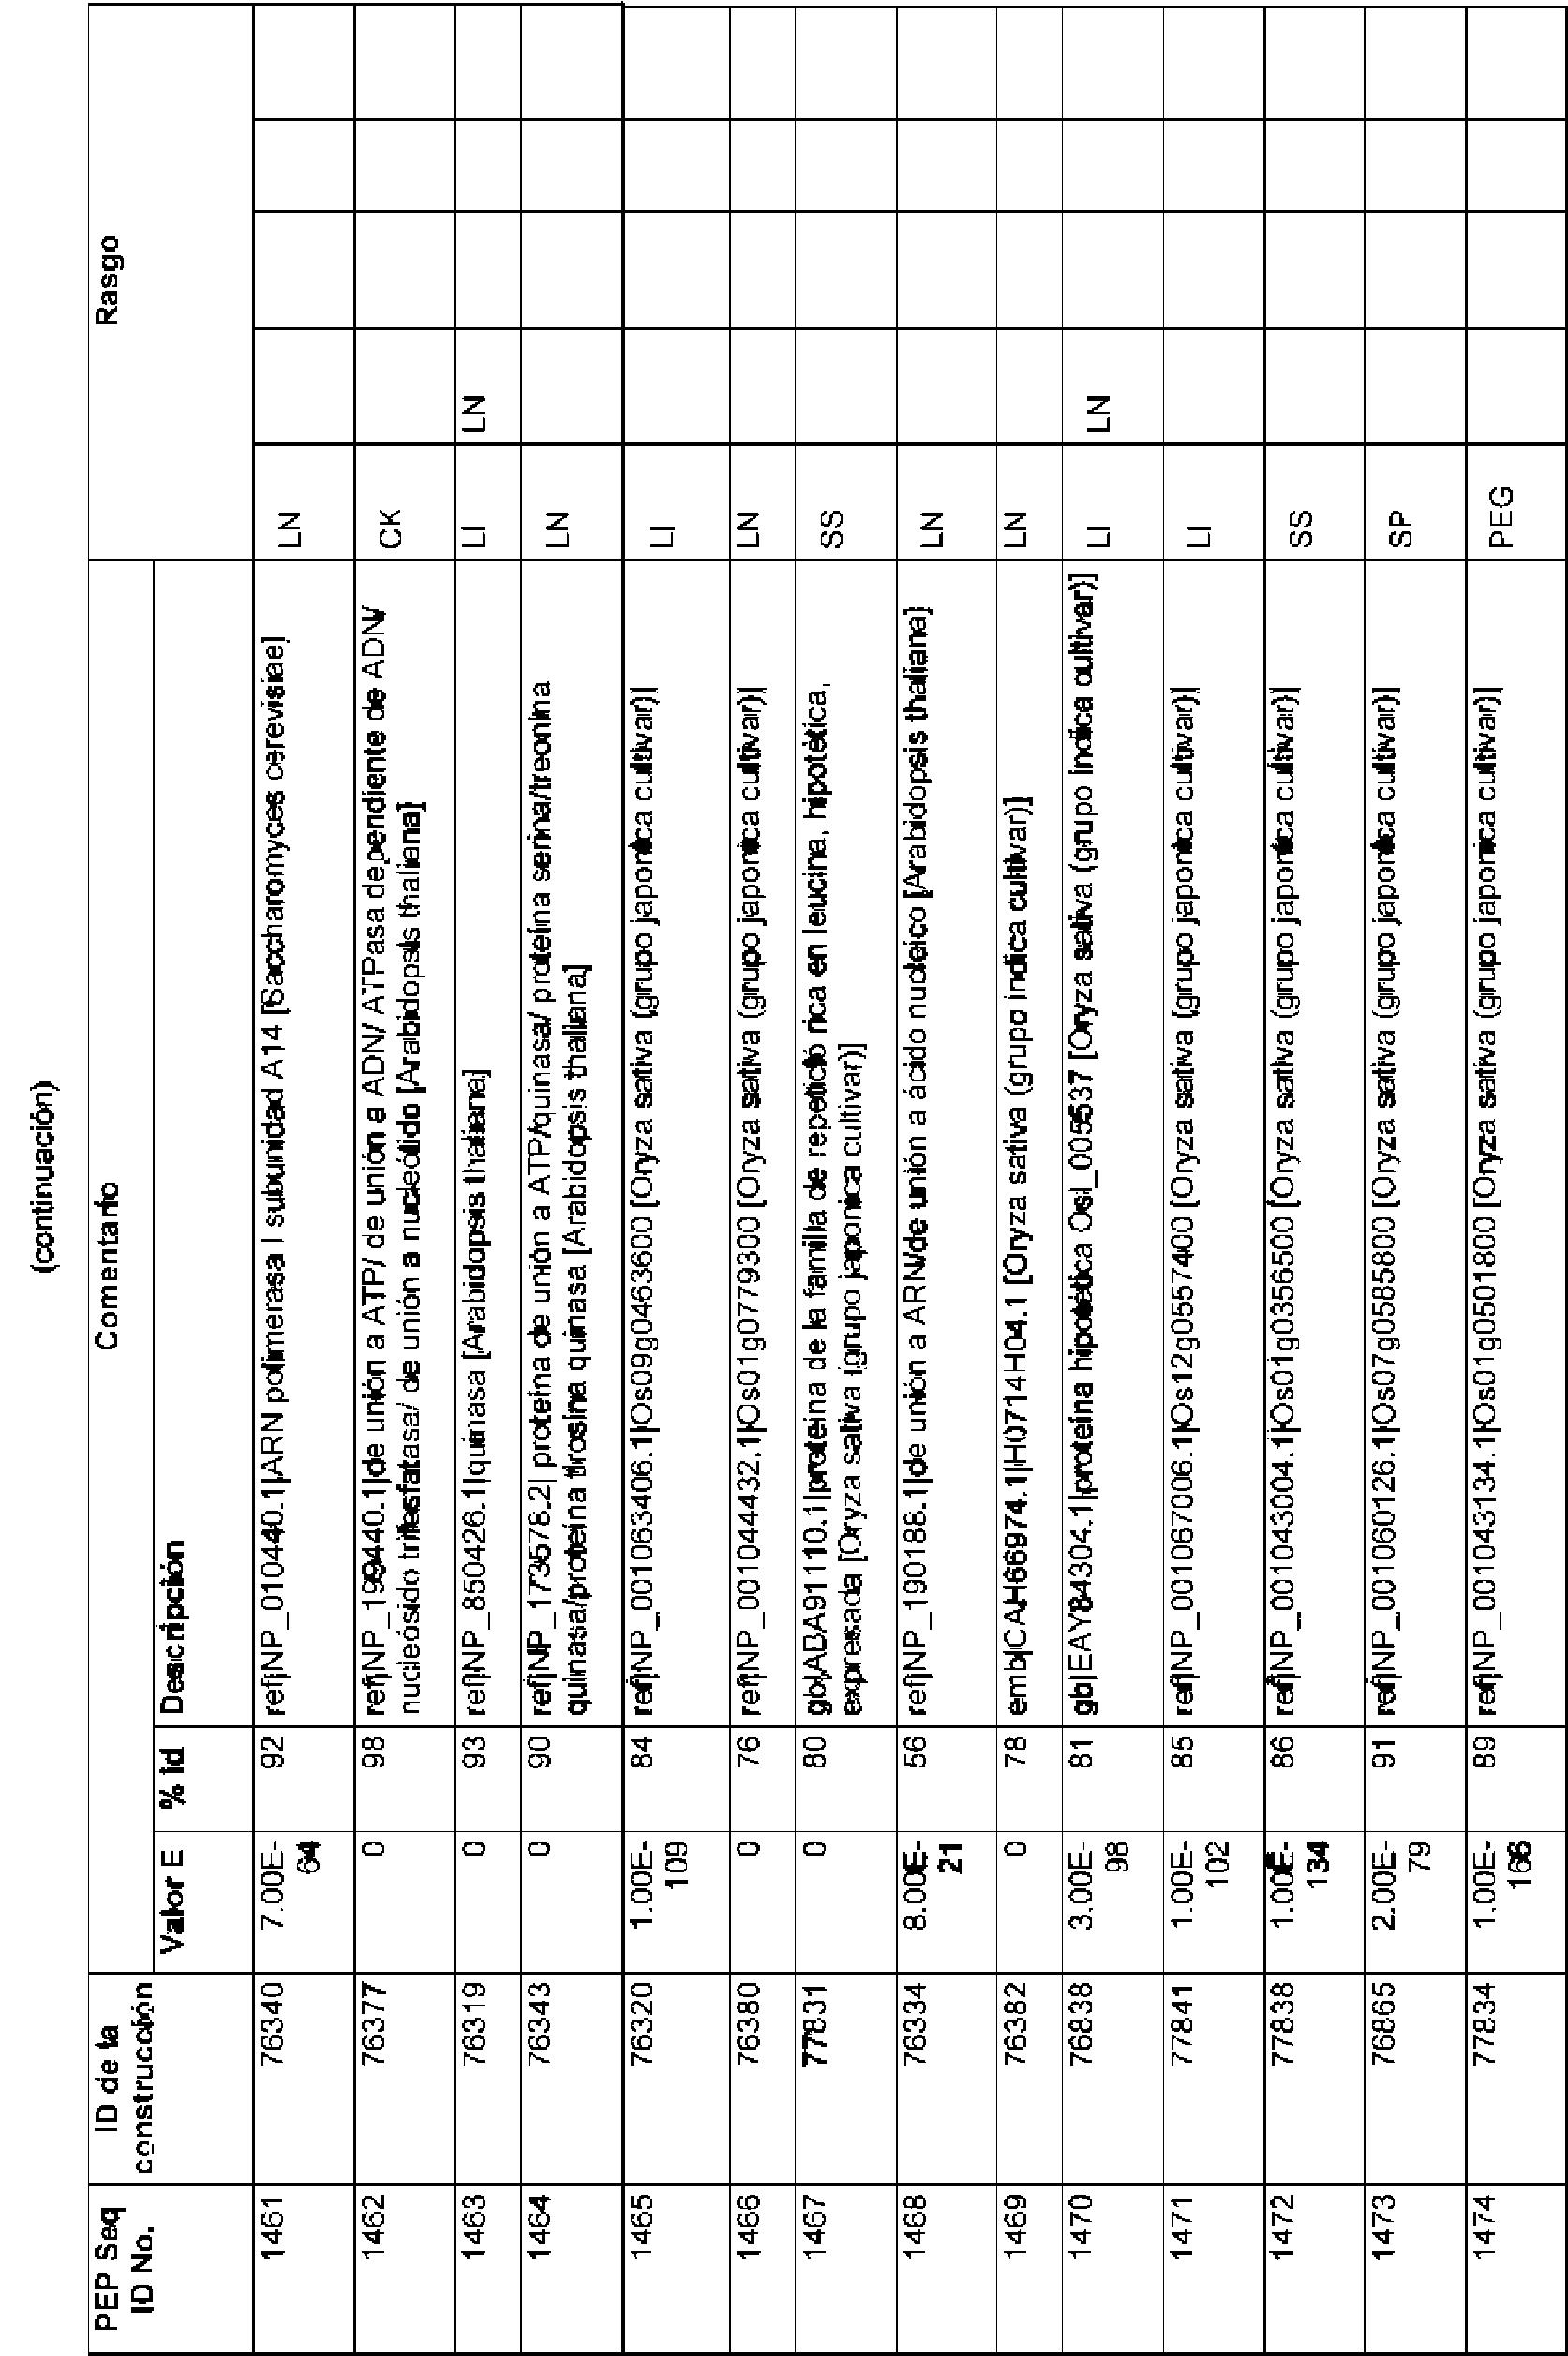 102/62 presión arterial femenina